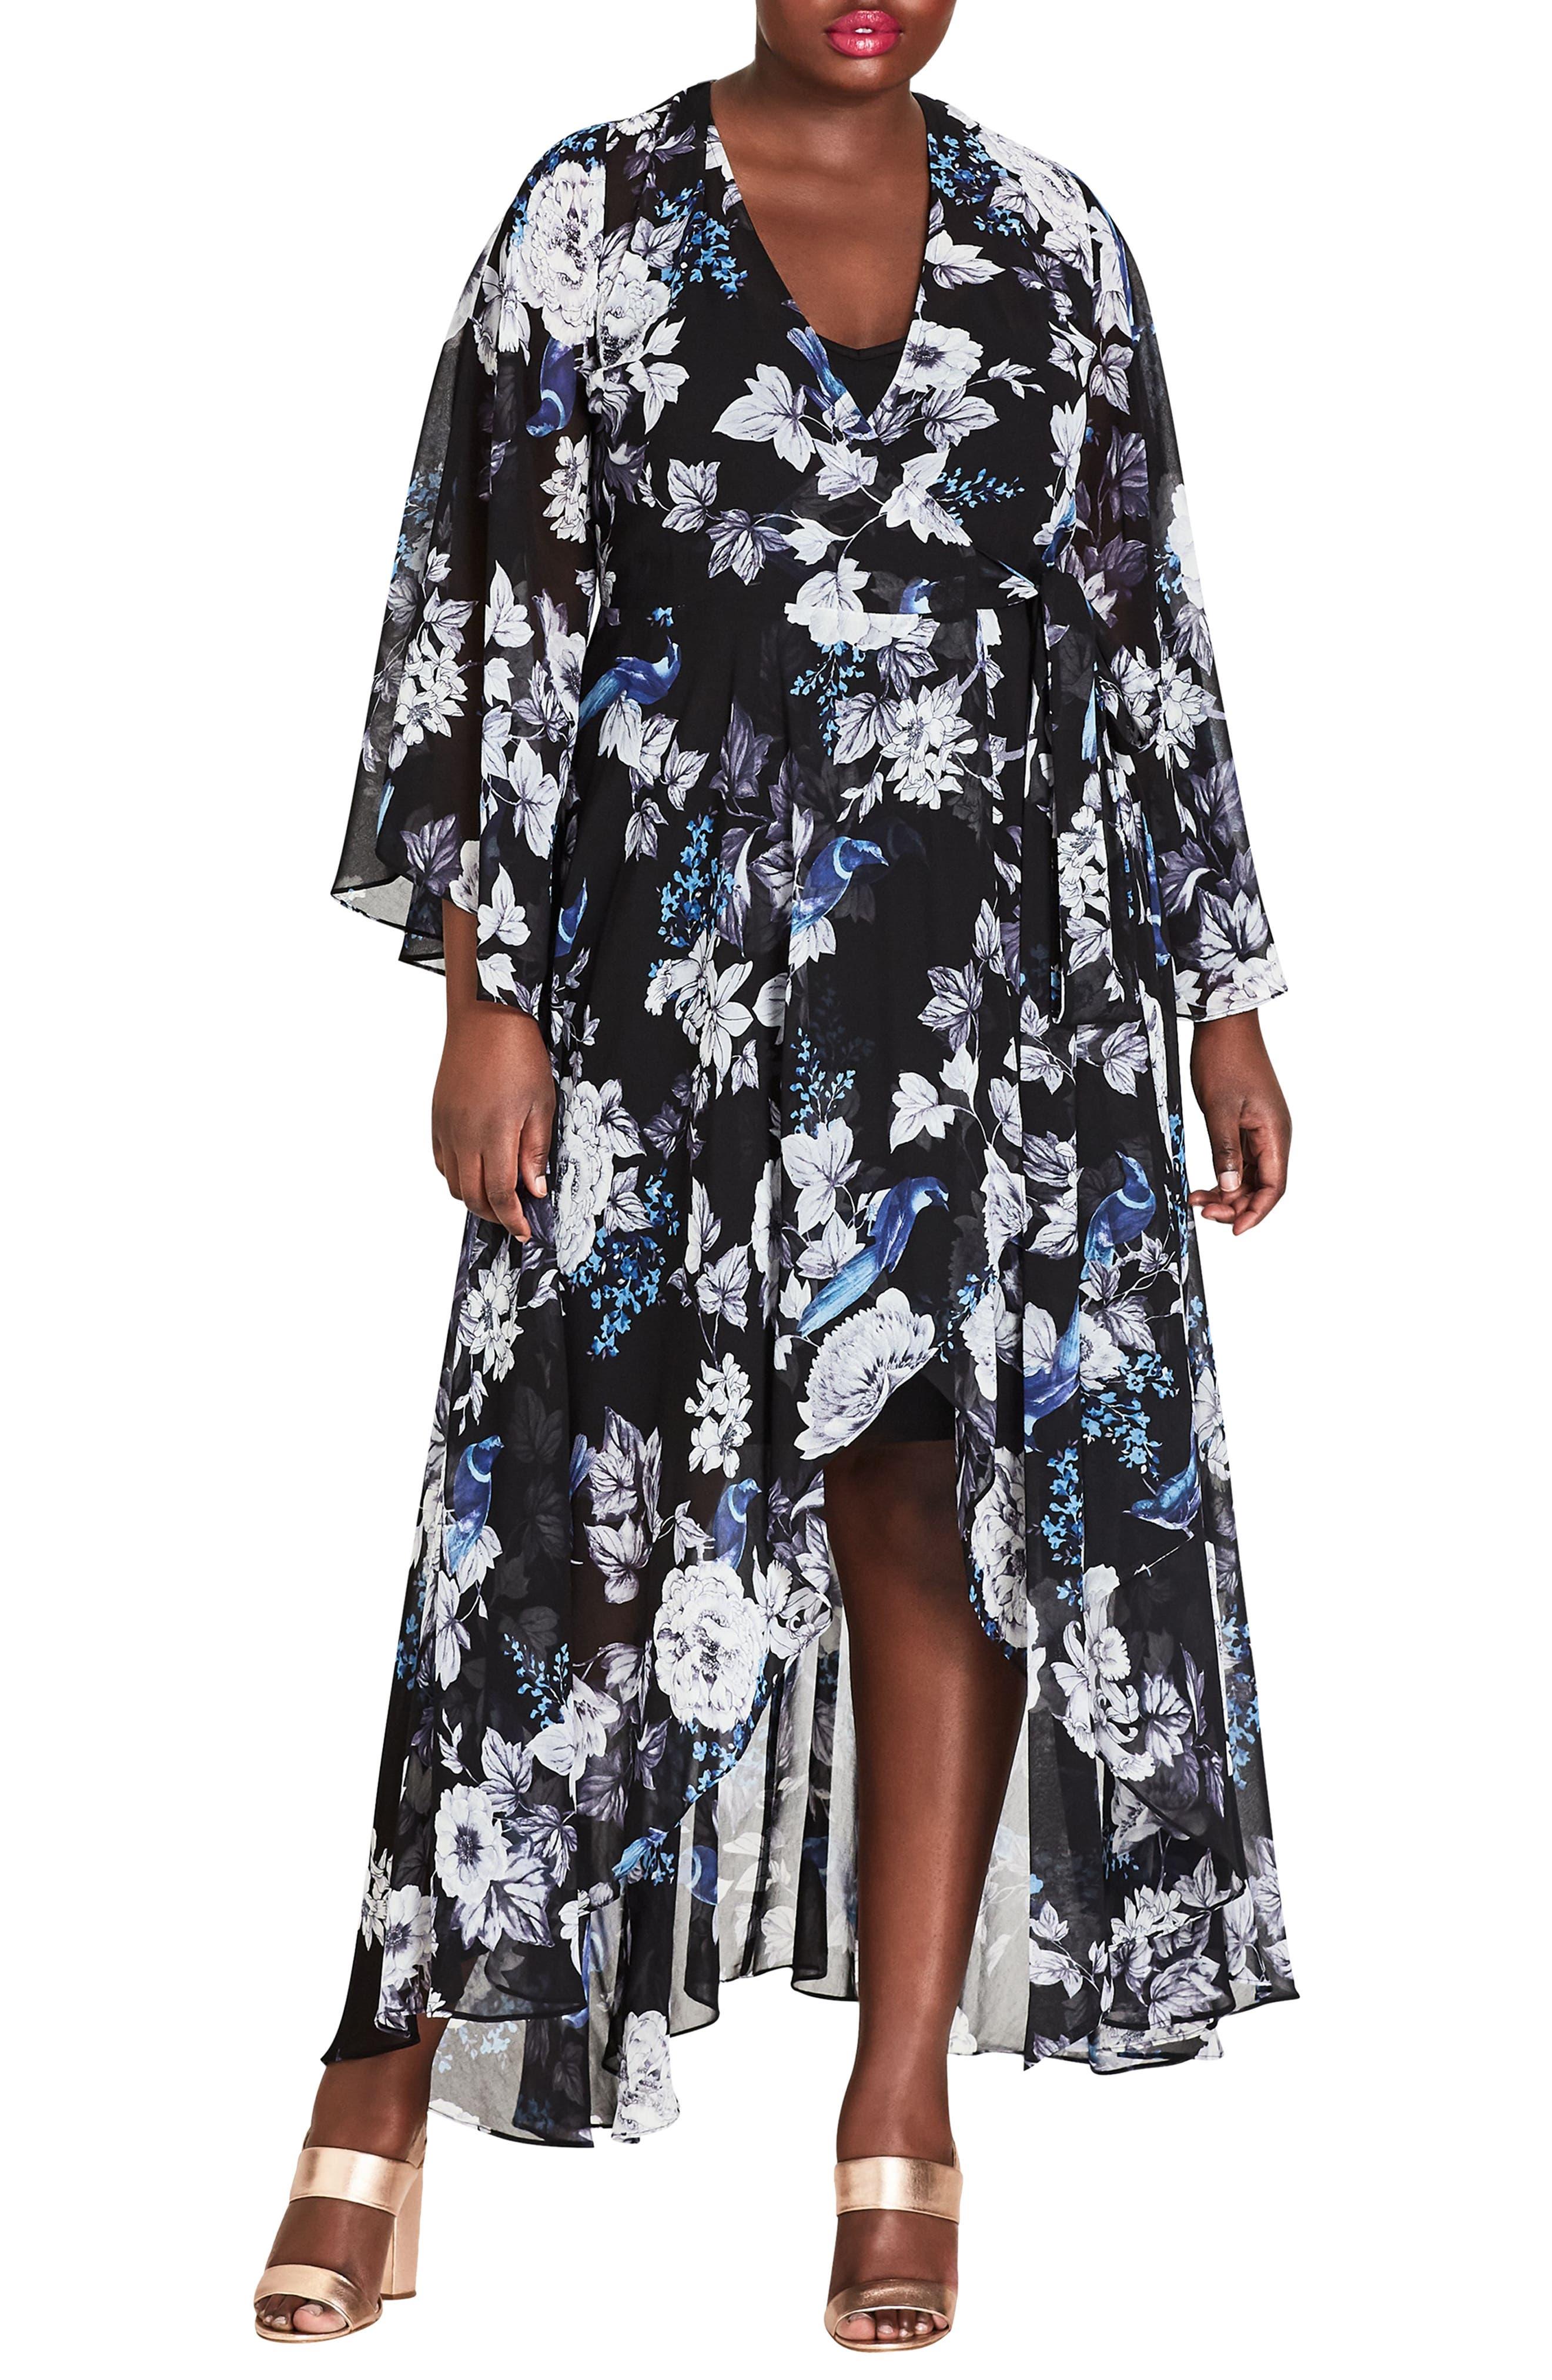 Plus Size City Chic Blackbird Maxi Dress